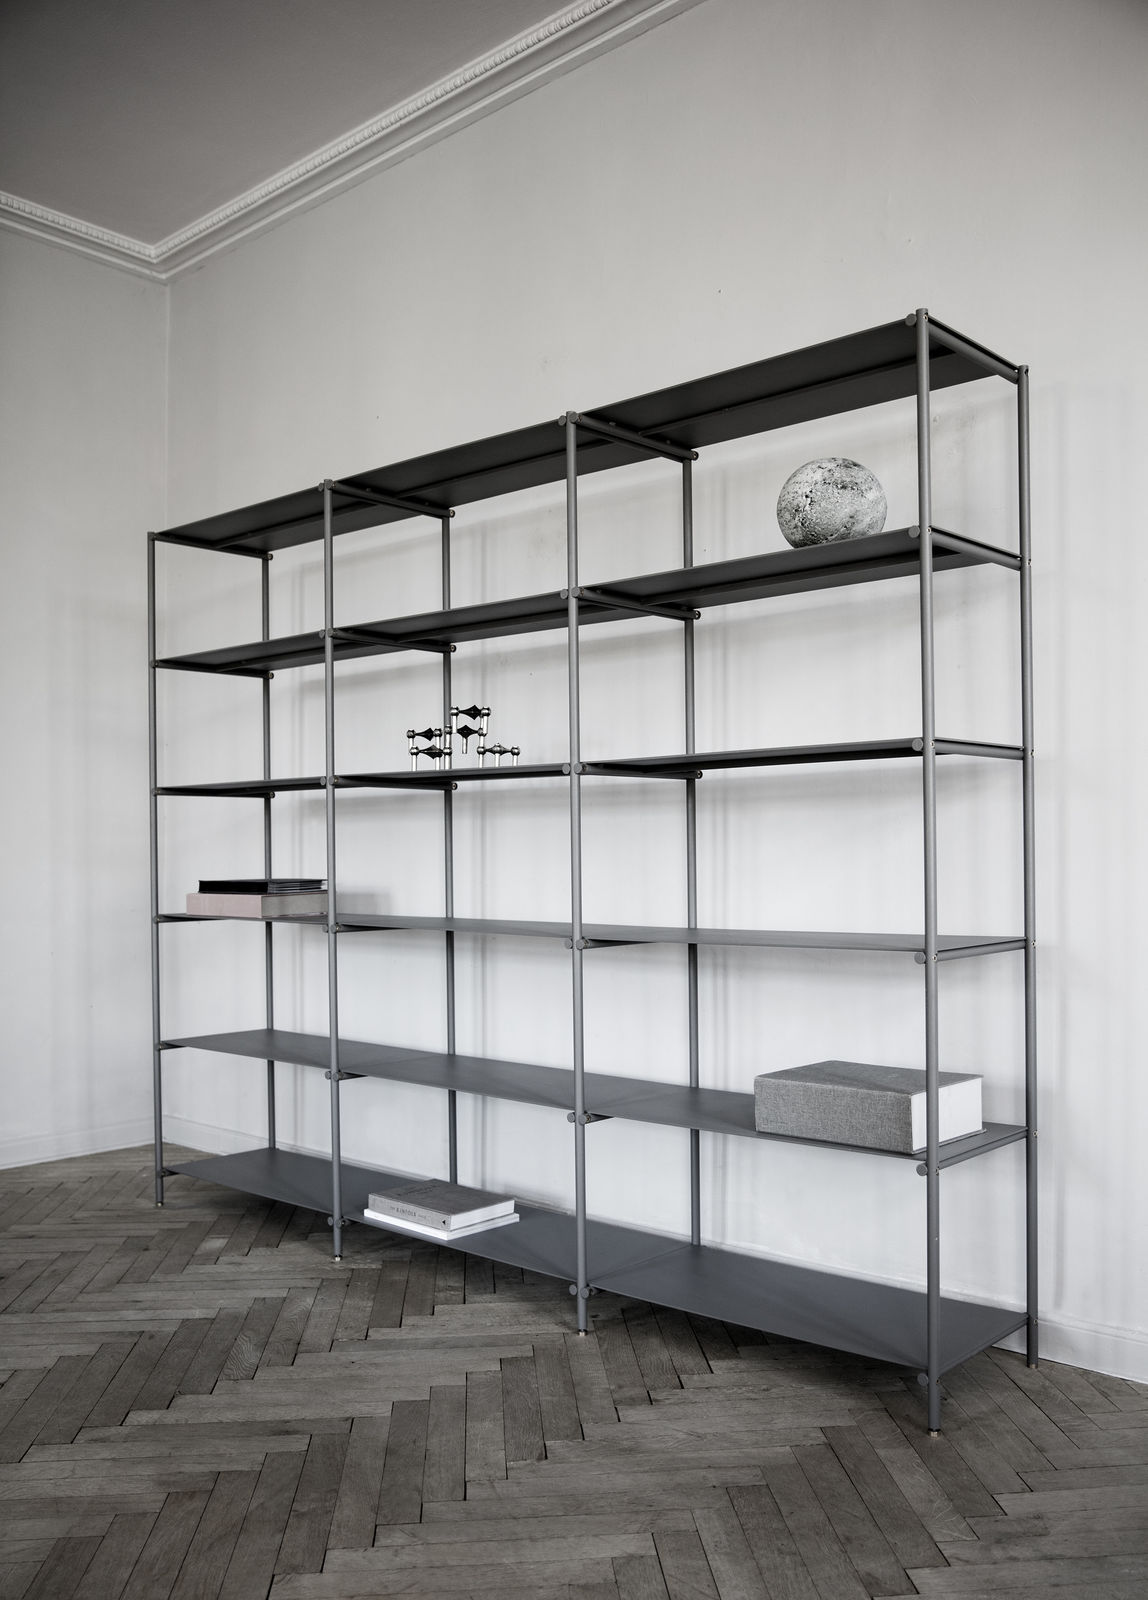 Friends_and_Founders_Shelvish _shelves_Metal_gestalt_new_york_furniture.jpg